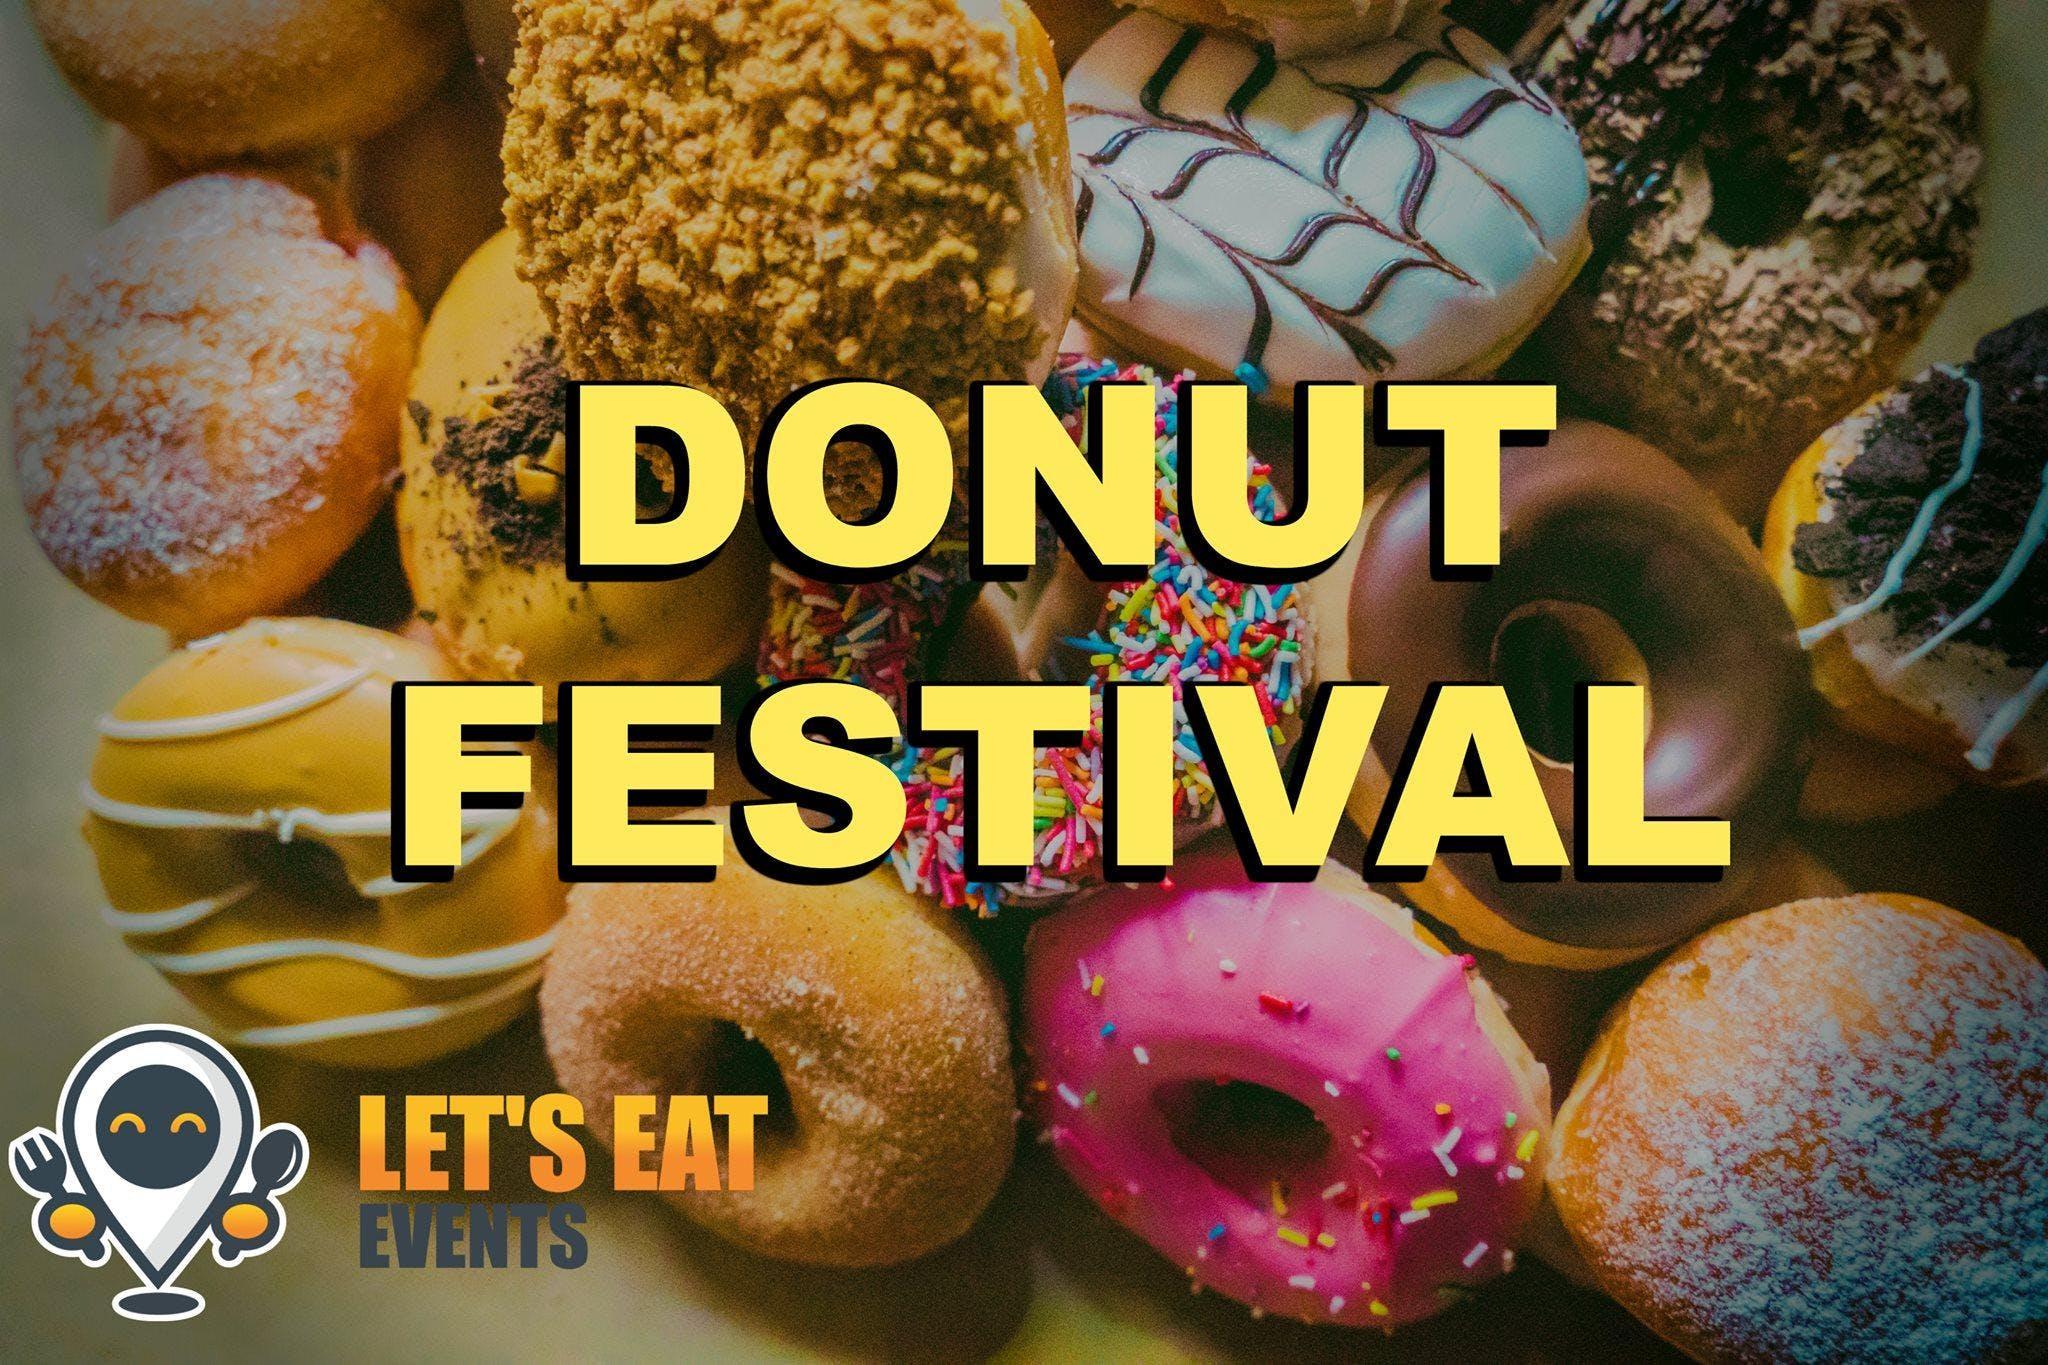 Arizona Donut Festival